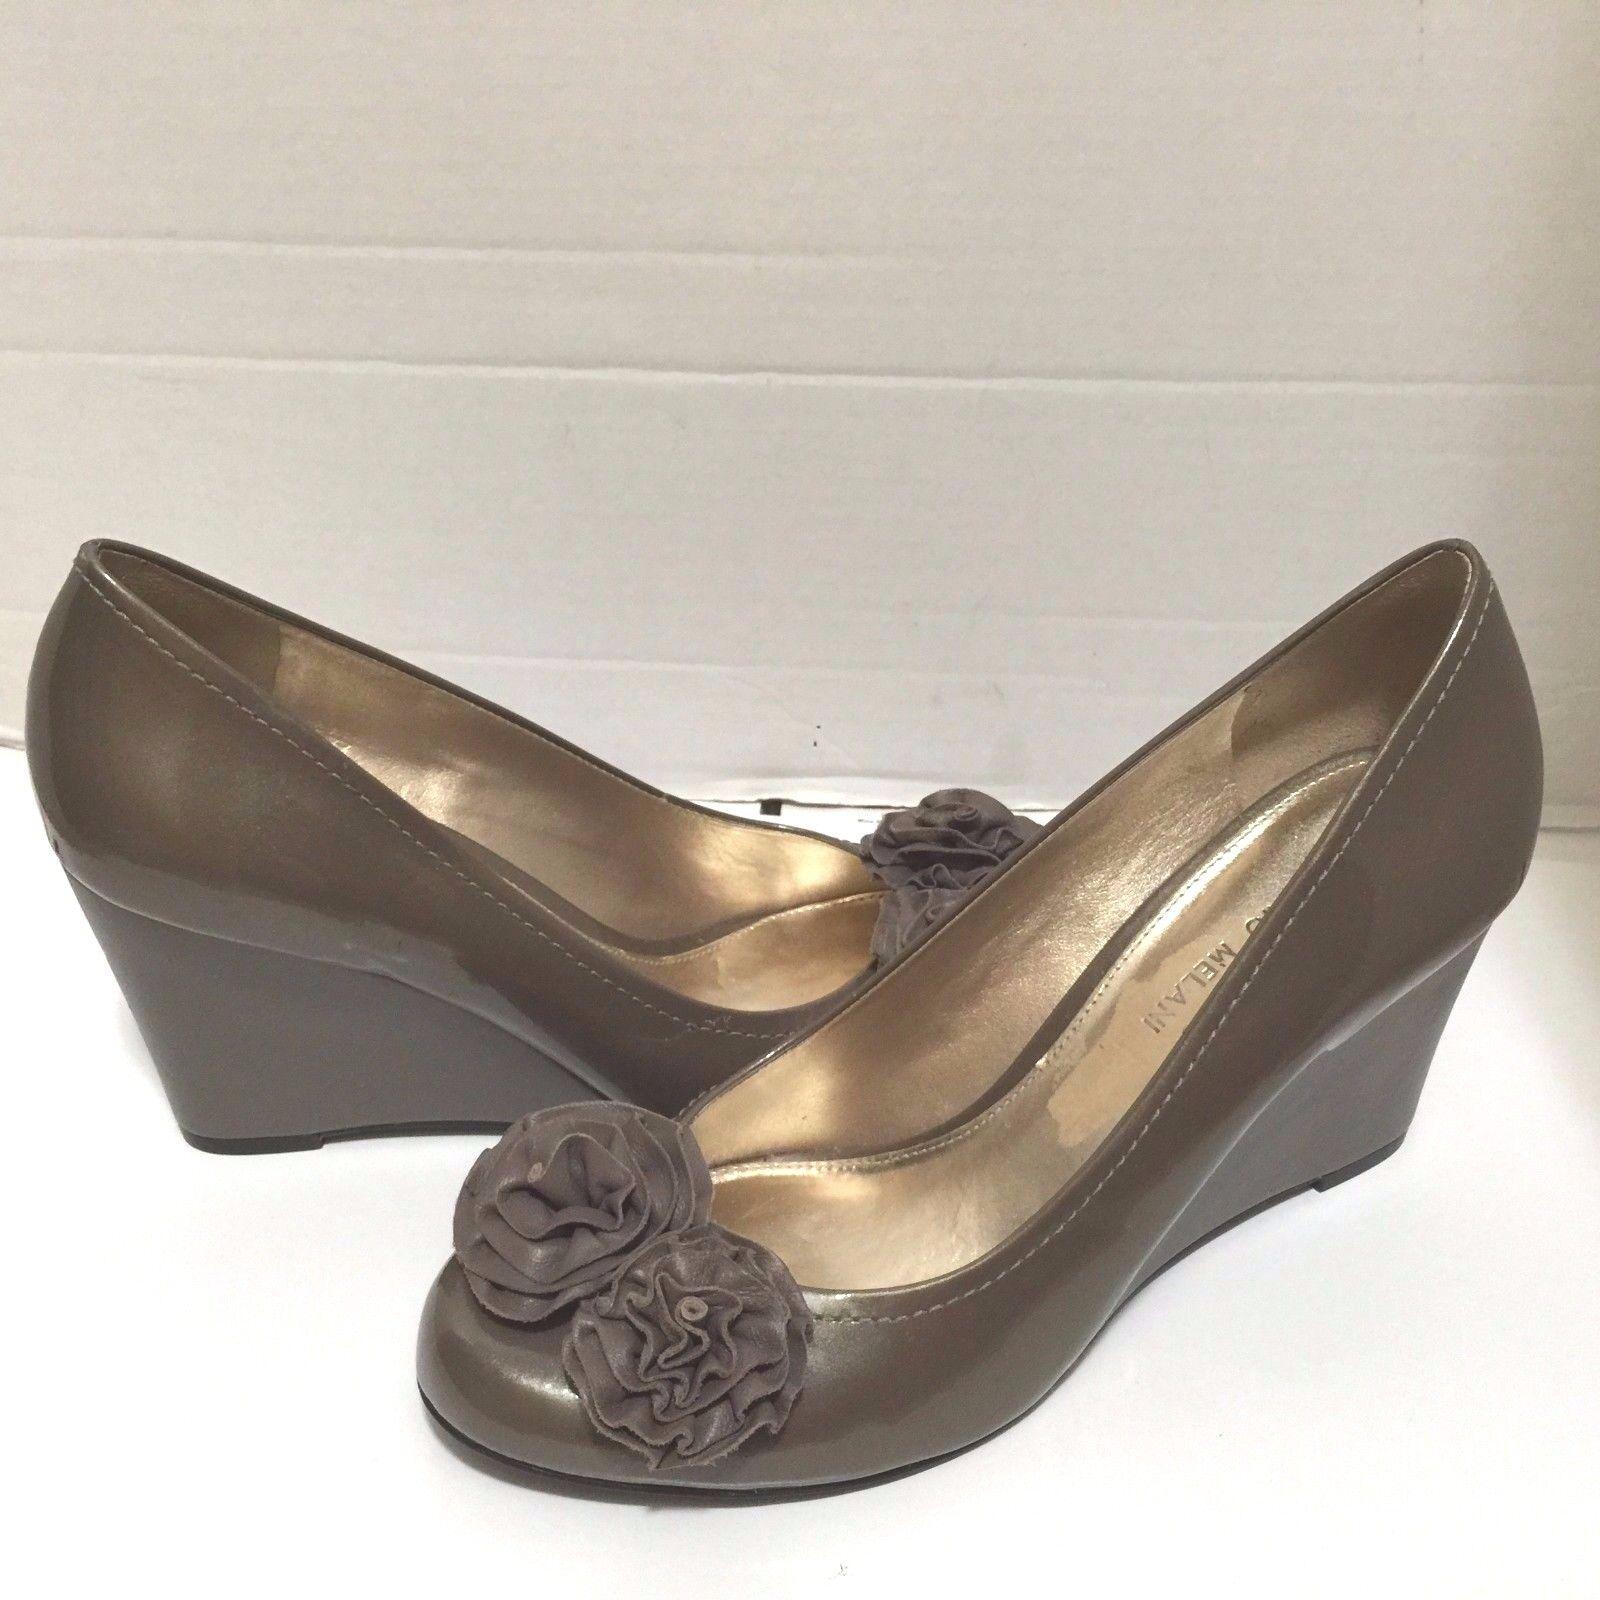 Antonio Melani Taupe Patent Leather Wedge Pump Shoes 10